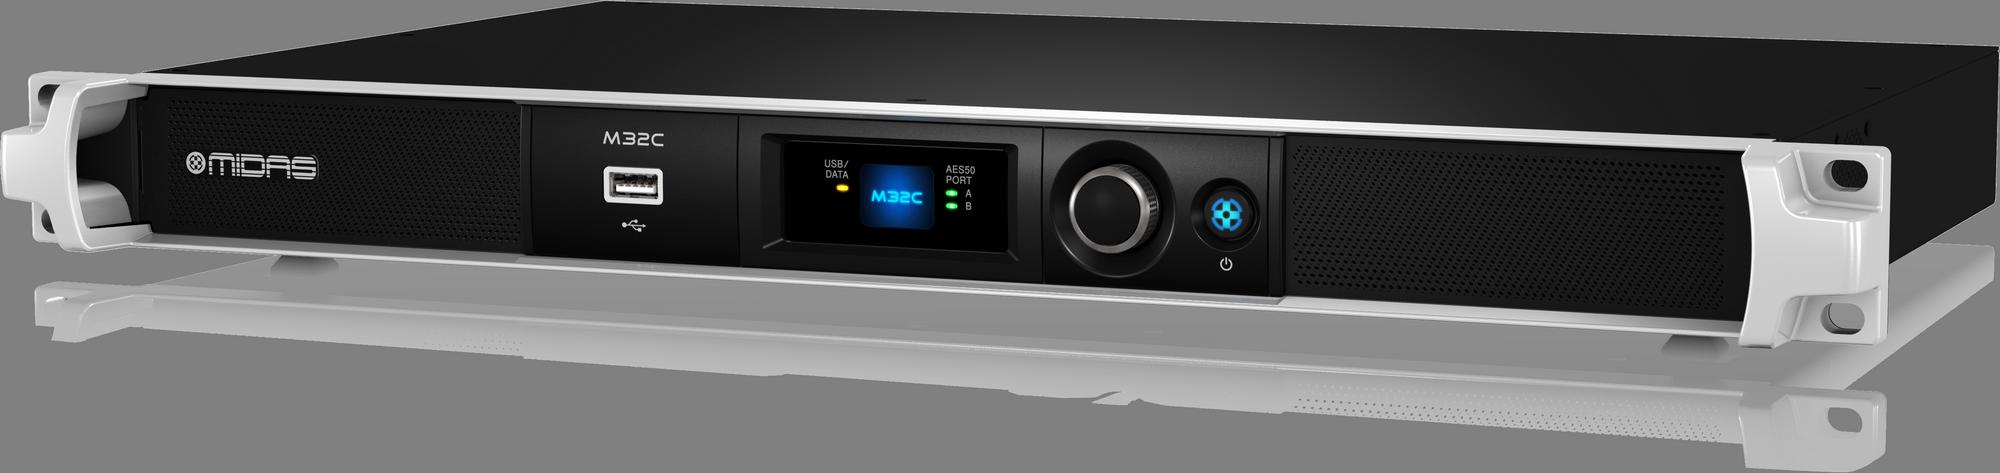 Midas M32C Midas Digital 1HE rack mixer multifonctionnel